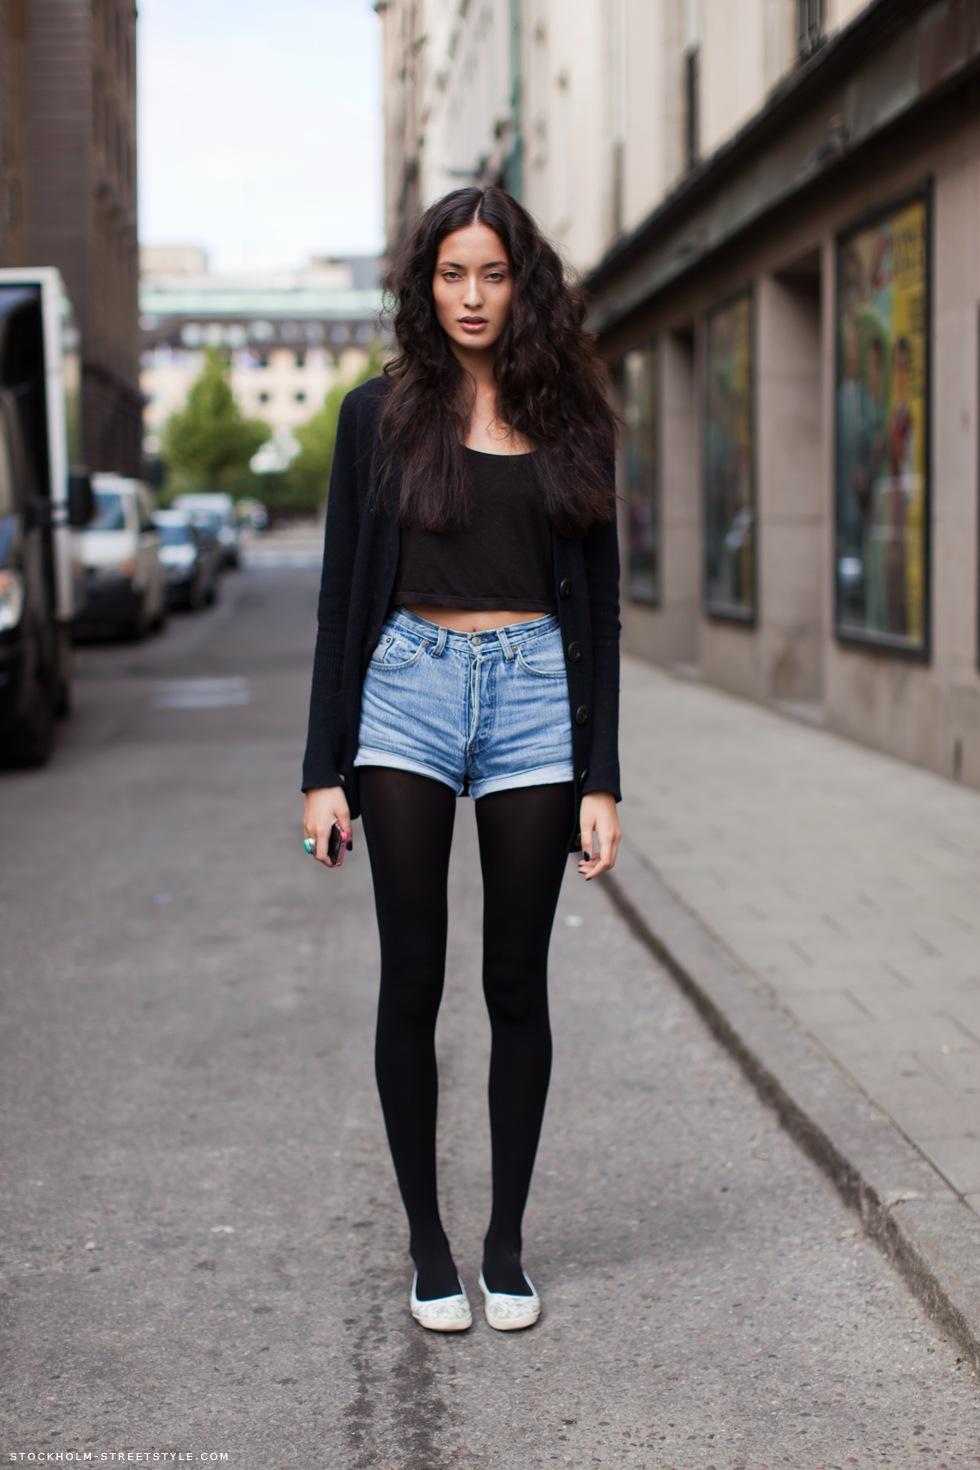 Lylia 39 S Diary Stockholm Street Style